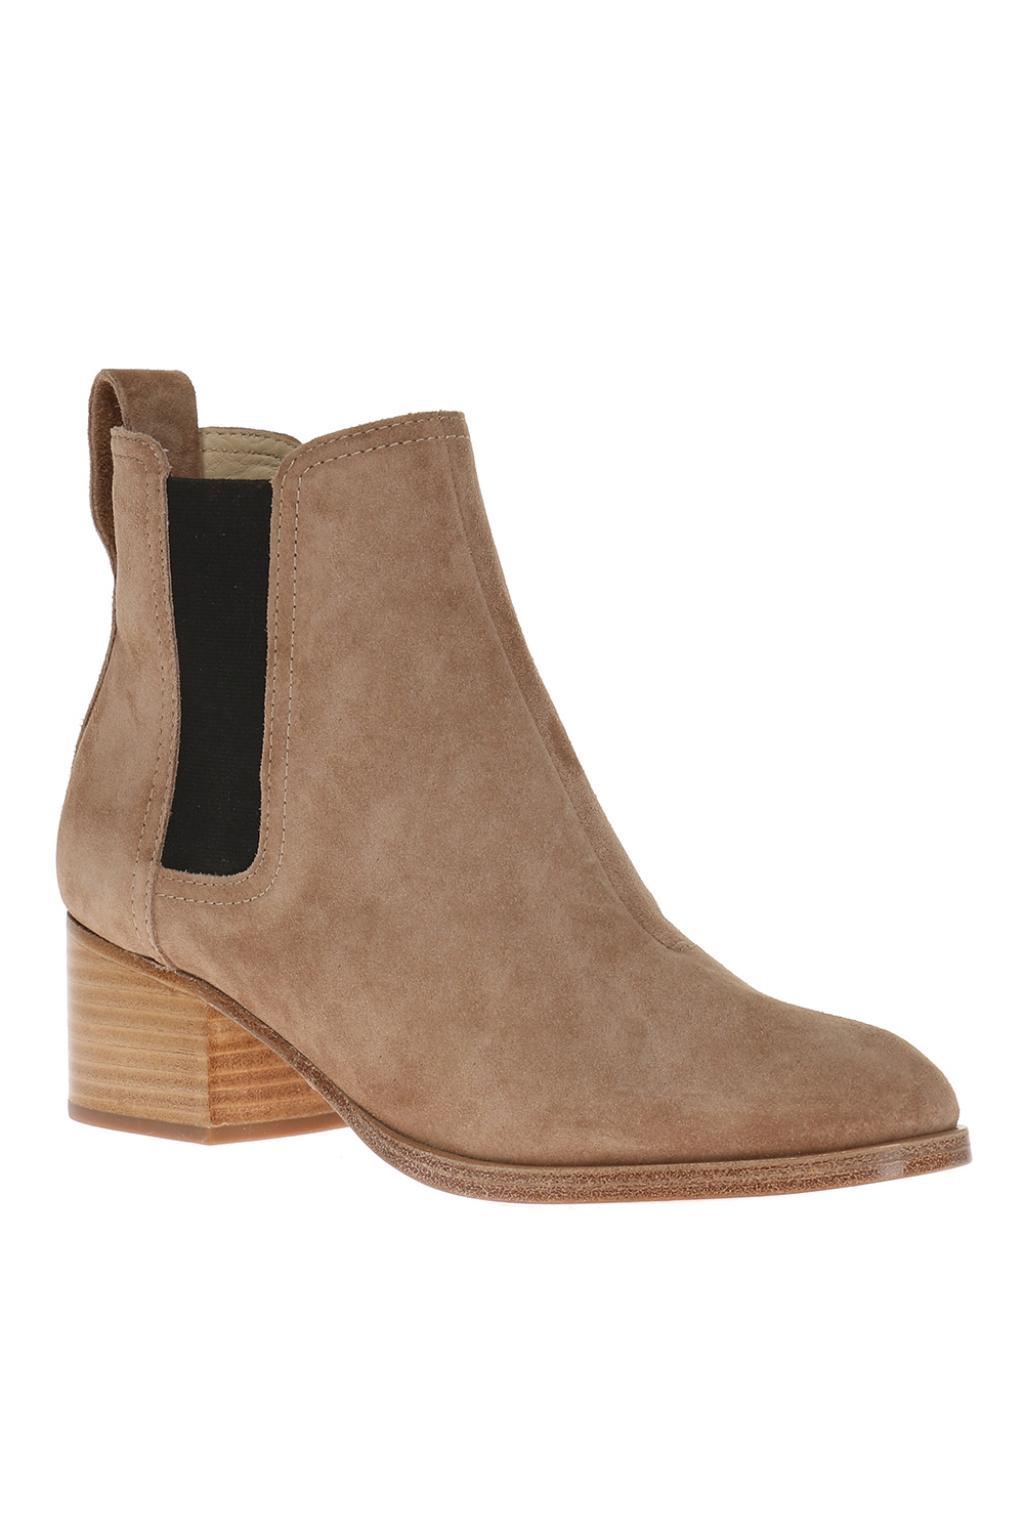 Rag & Bone  Suede heeled chelsea boots